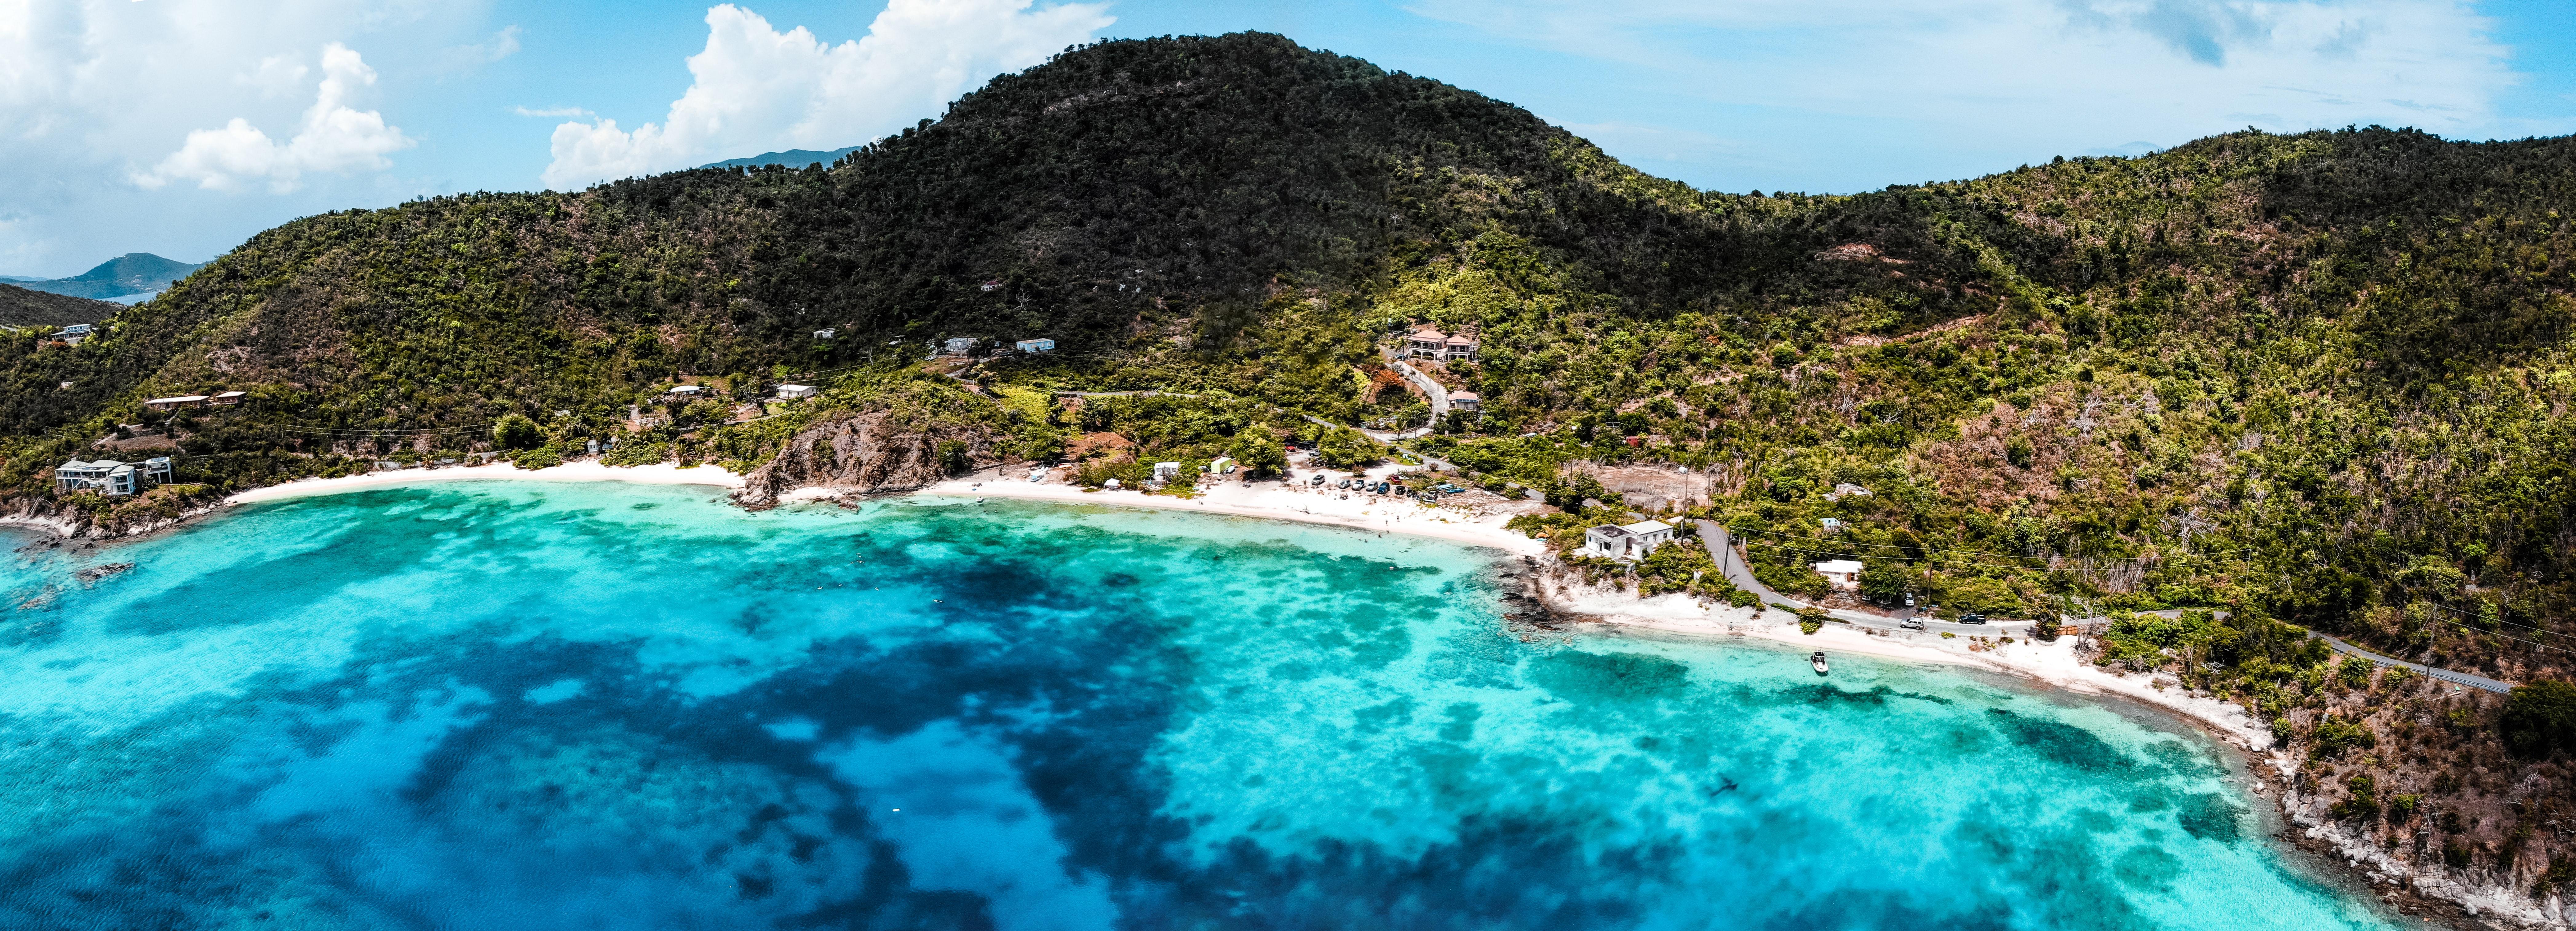 Island Hop and Enjoy Serene Seascapes on your Honeymoon in the U.S. Virgin Islands